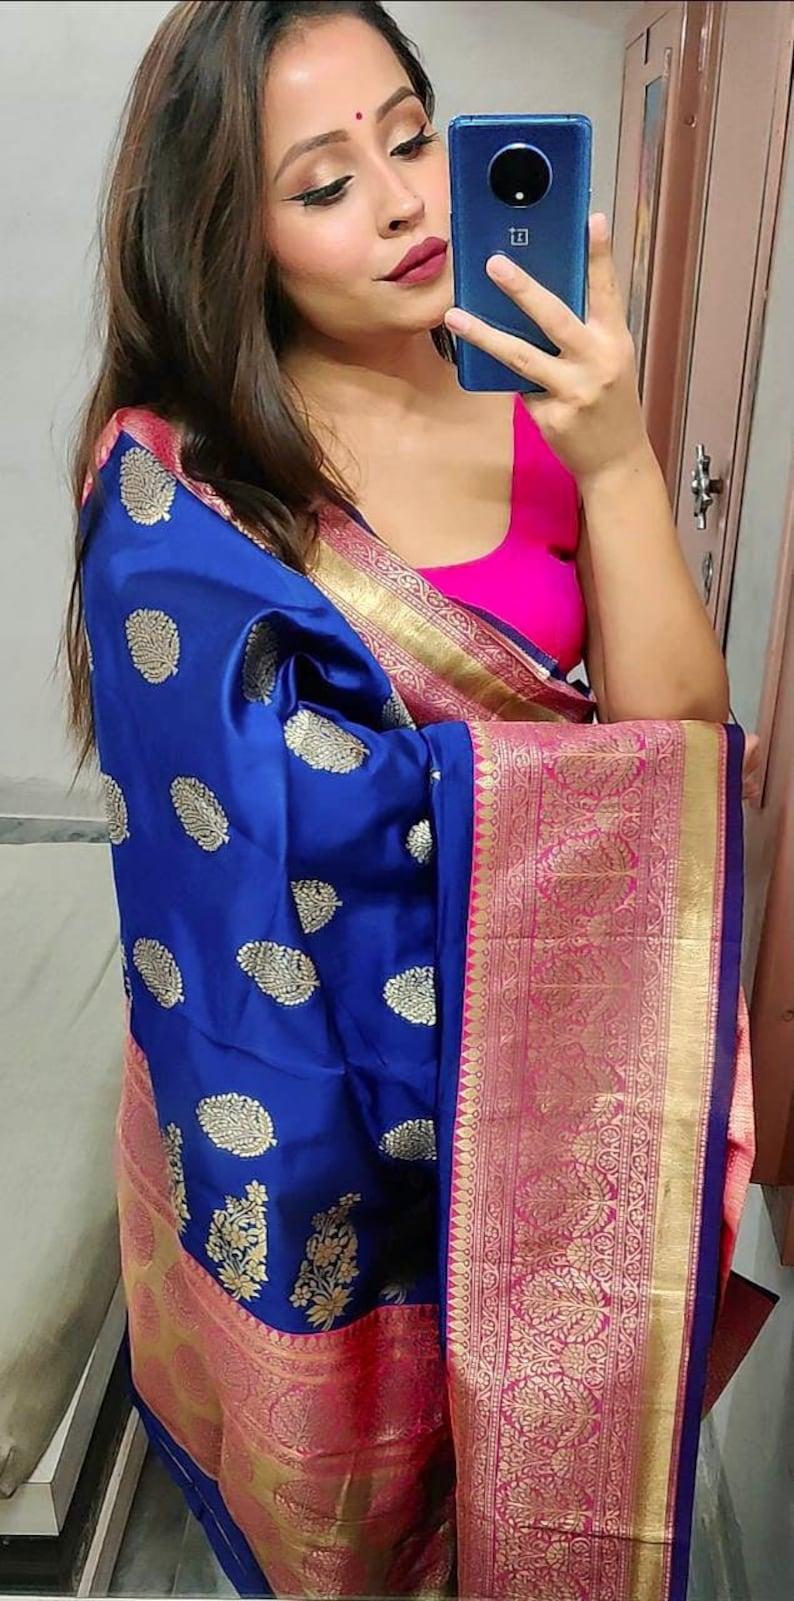 Beautiful Indian traditional soft Silk Sarees for Women Blue colour Designer Sari Party Minakari Rich Pallu Bollywood Saree with Blouse